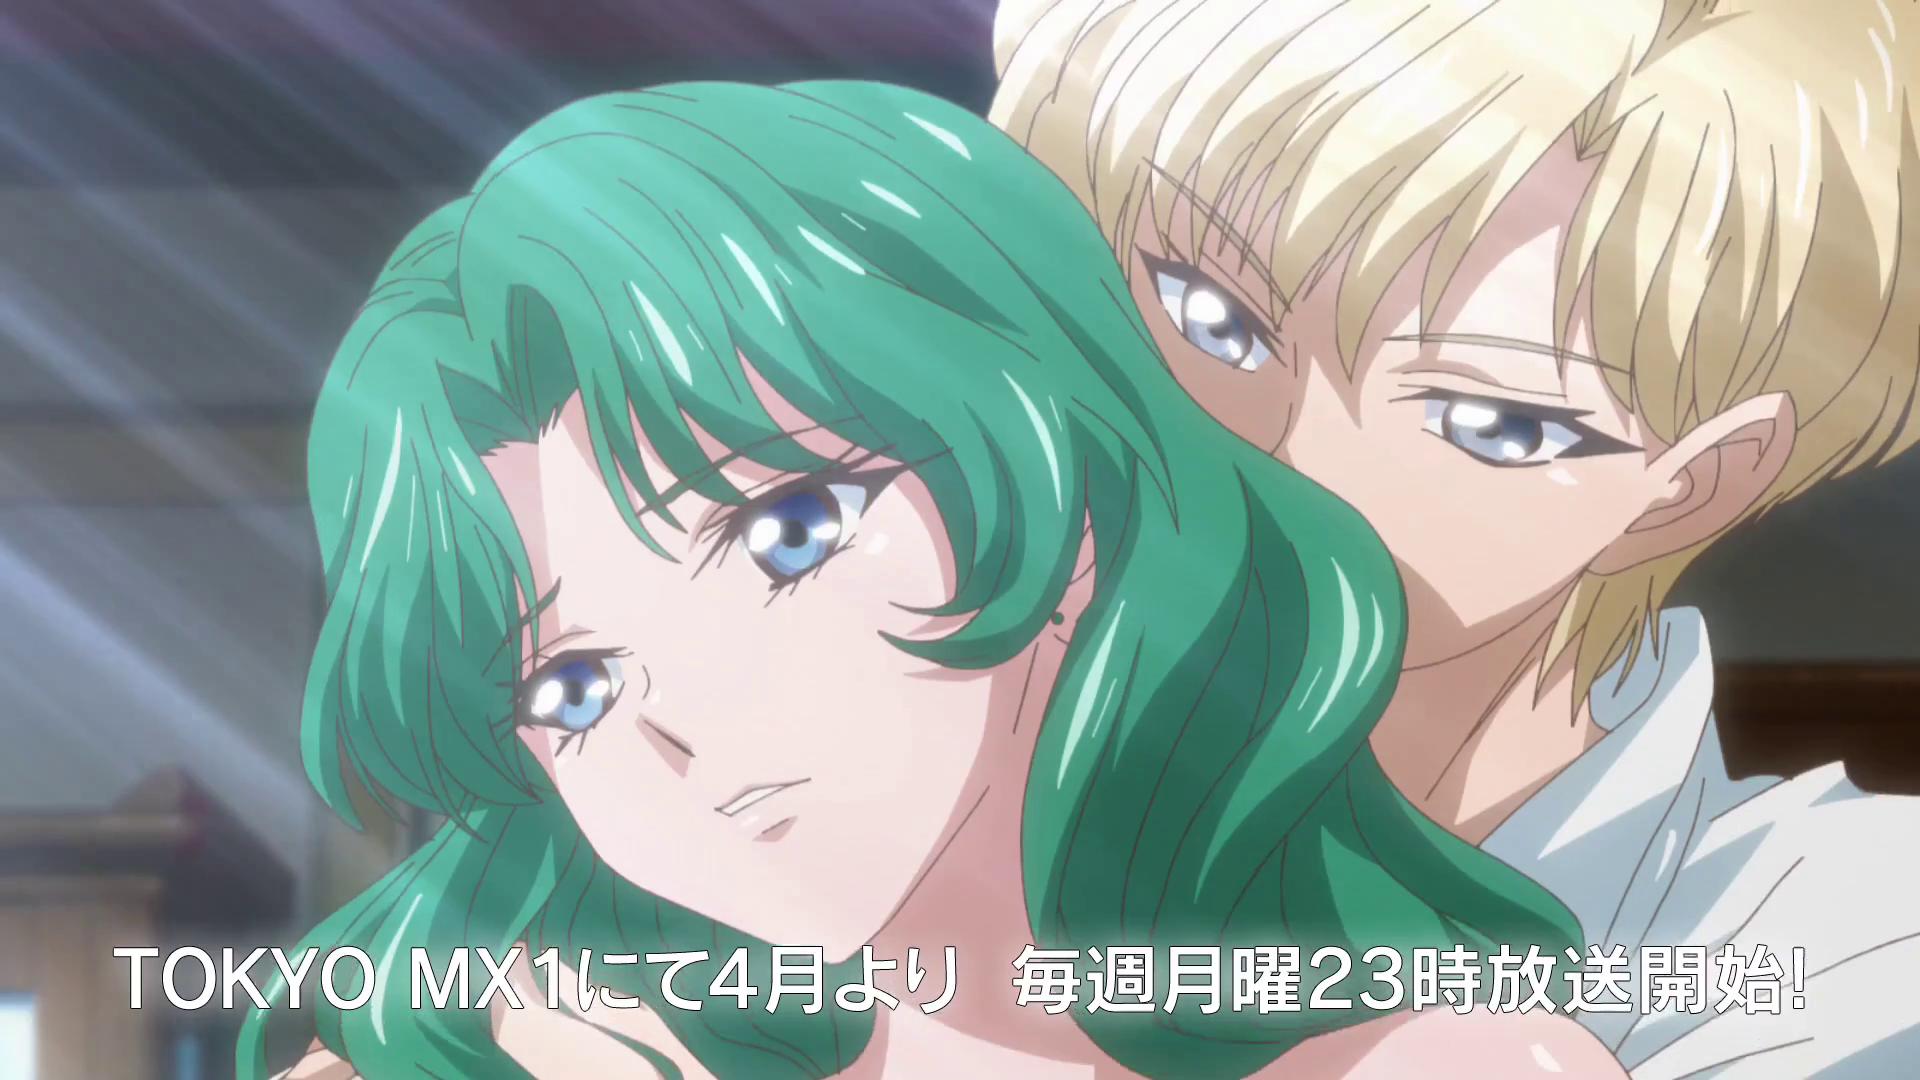 Sailor_Moon_Crystal_S3_Image_001